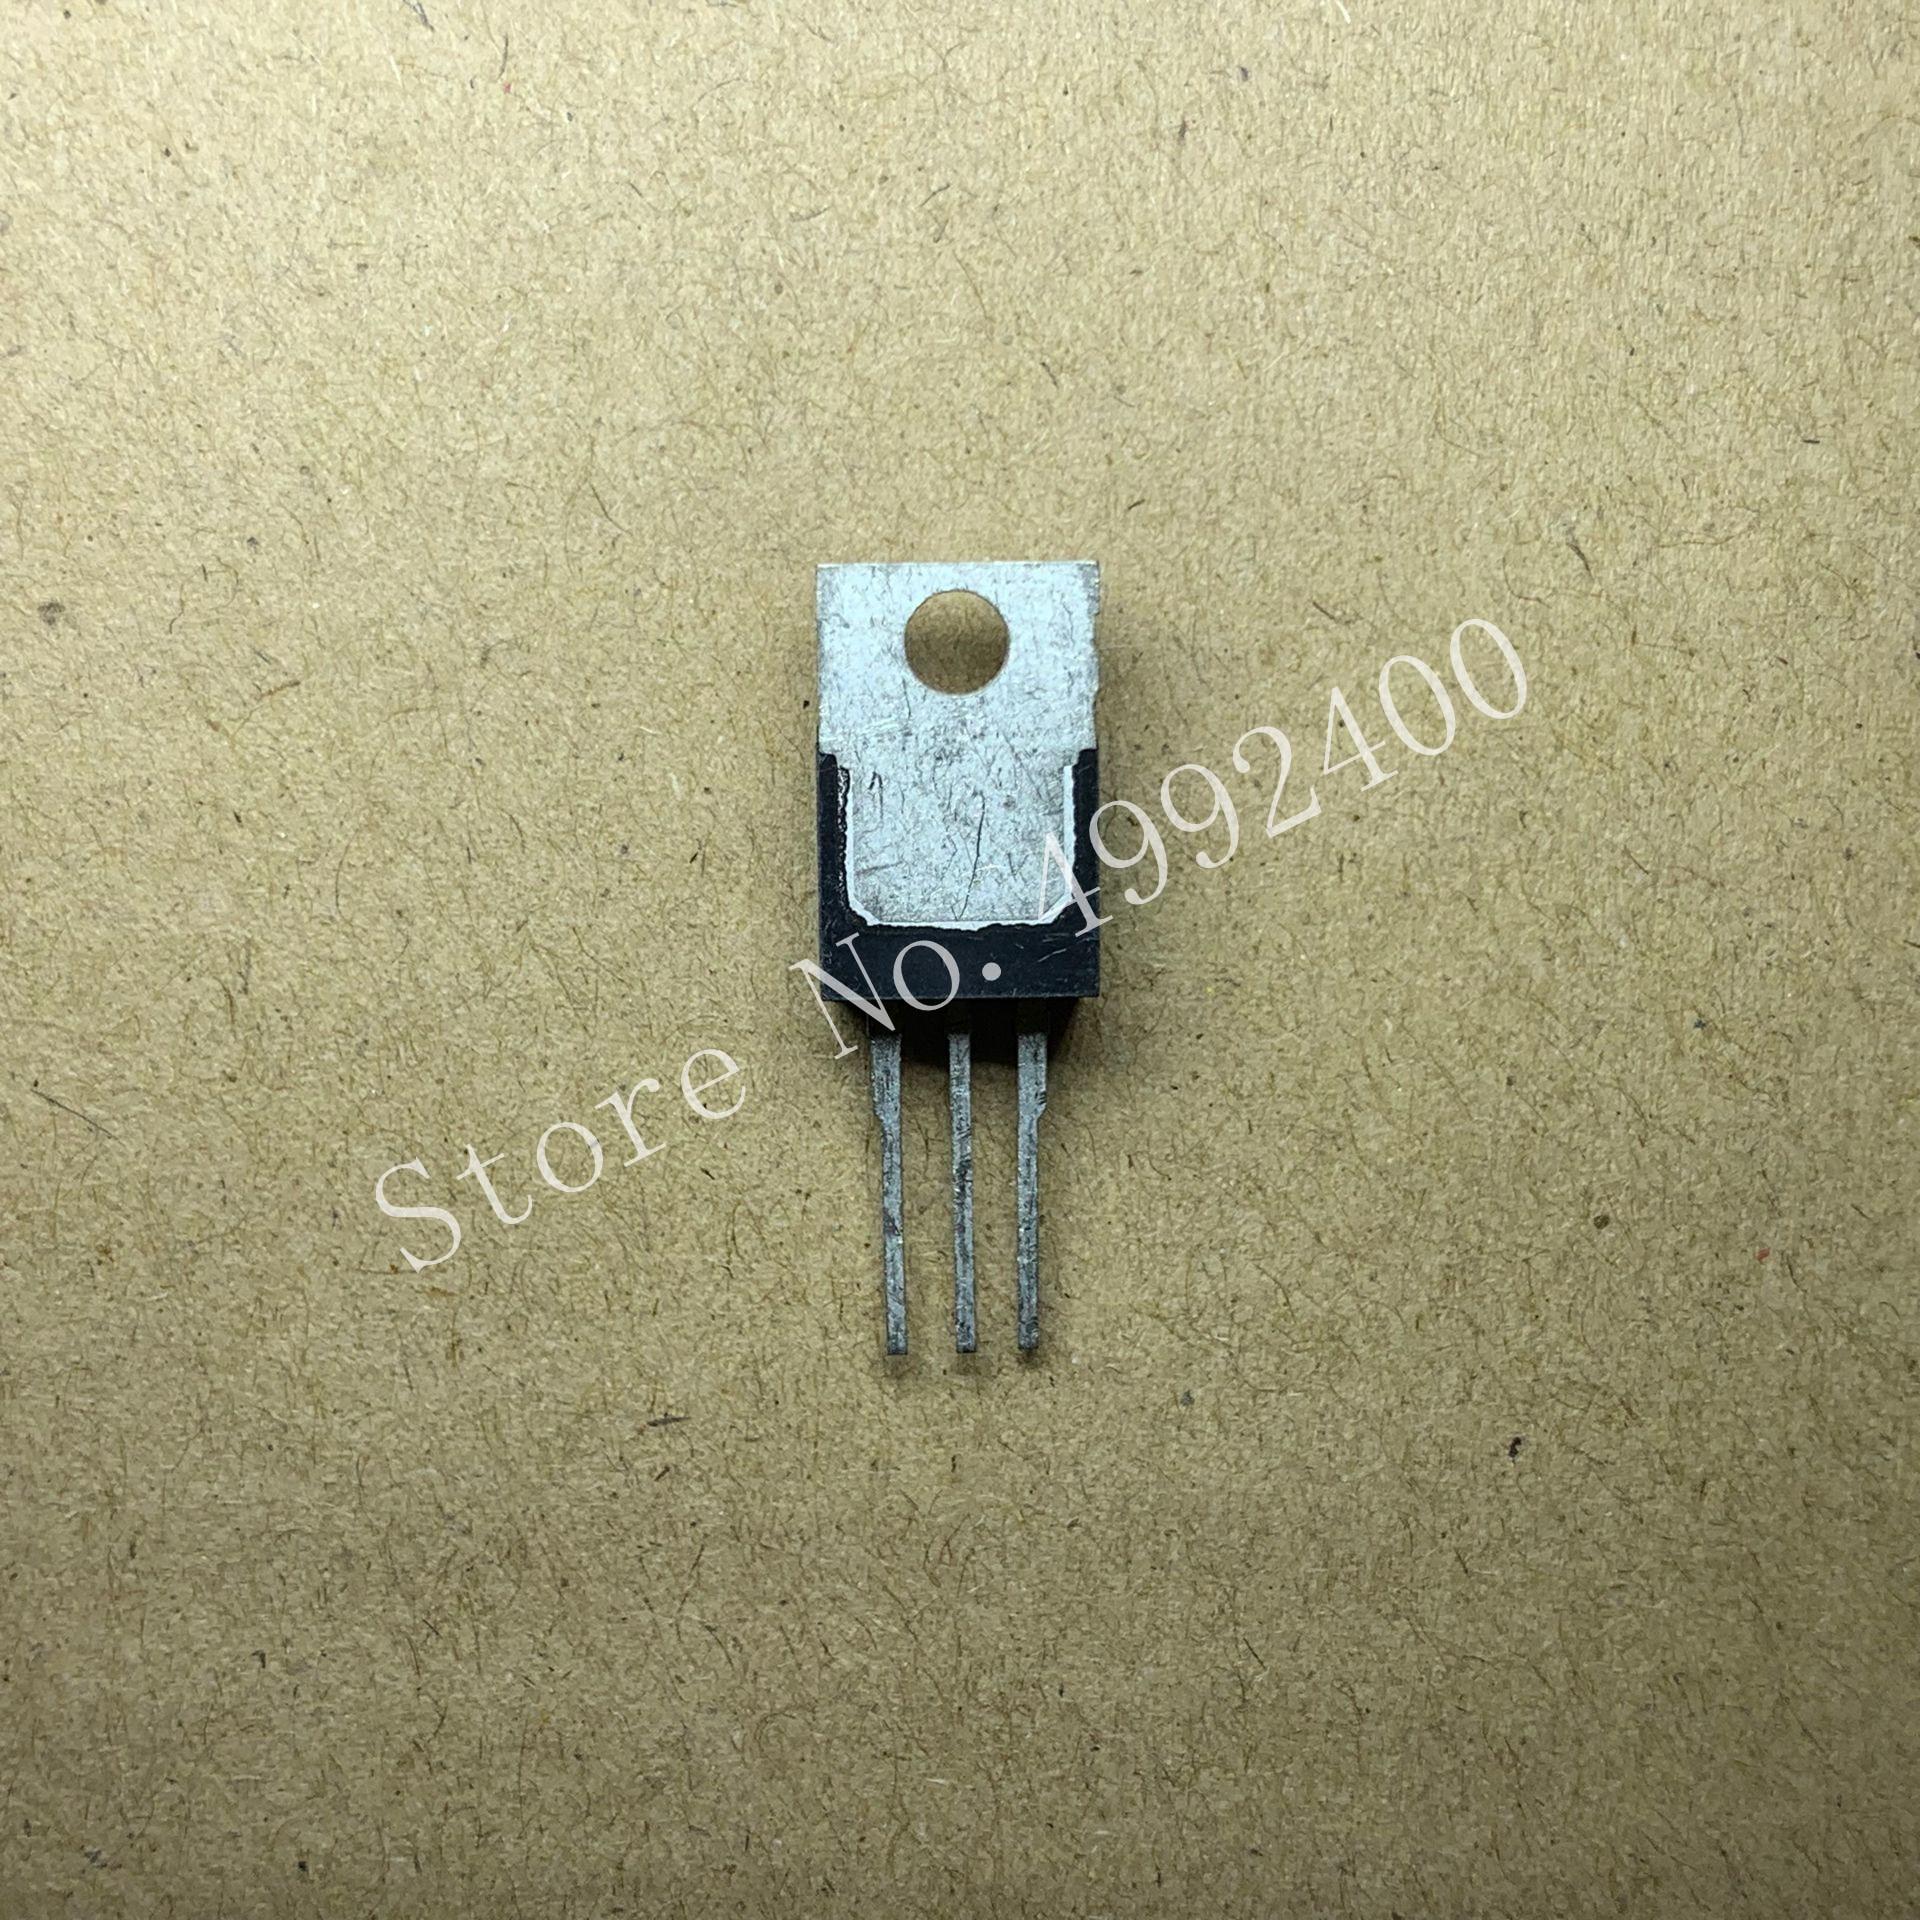 1 pçs/lote IPP90R500C 11A 9R500C PARA-220 900V